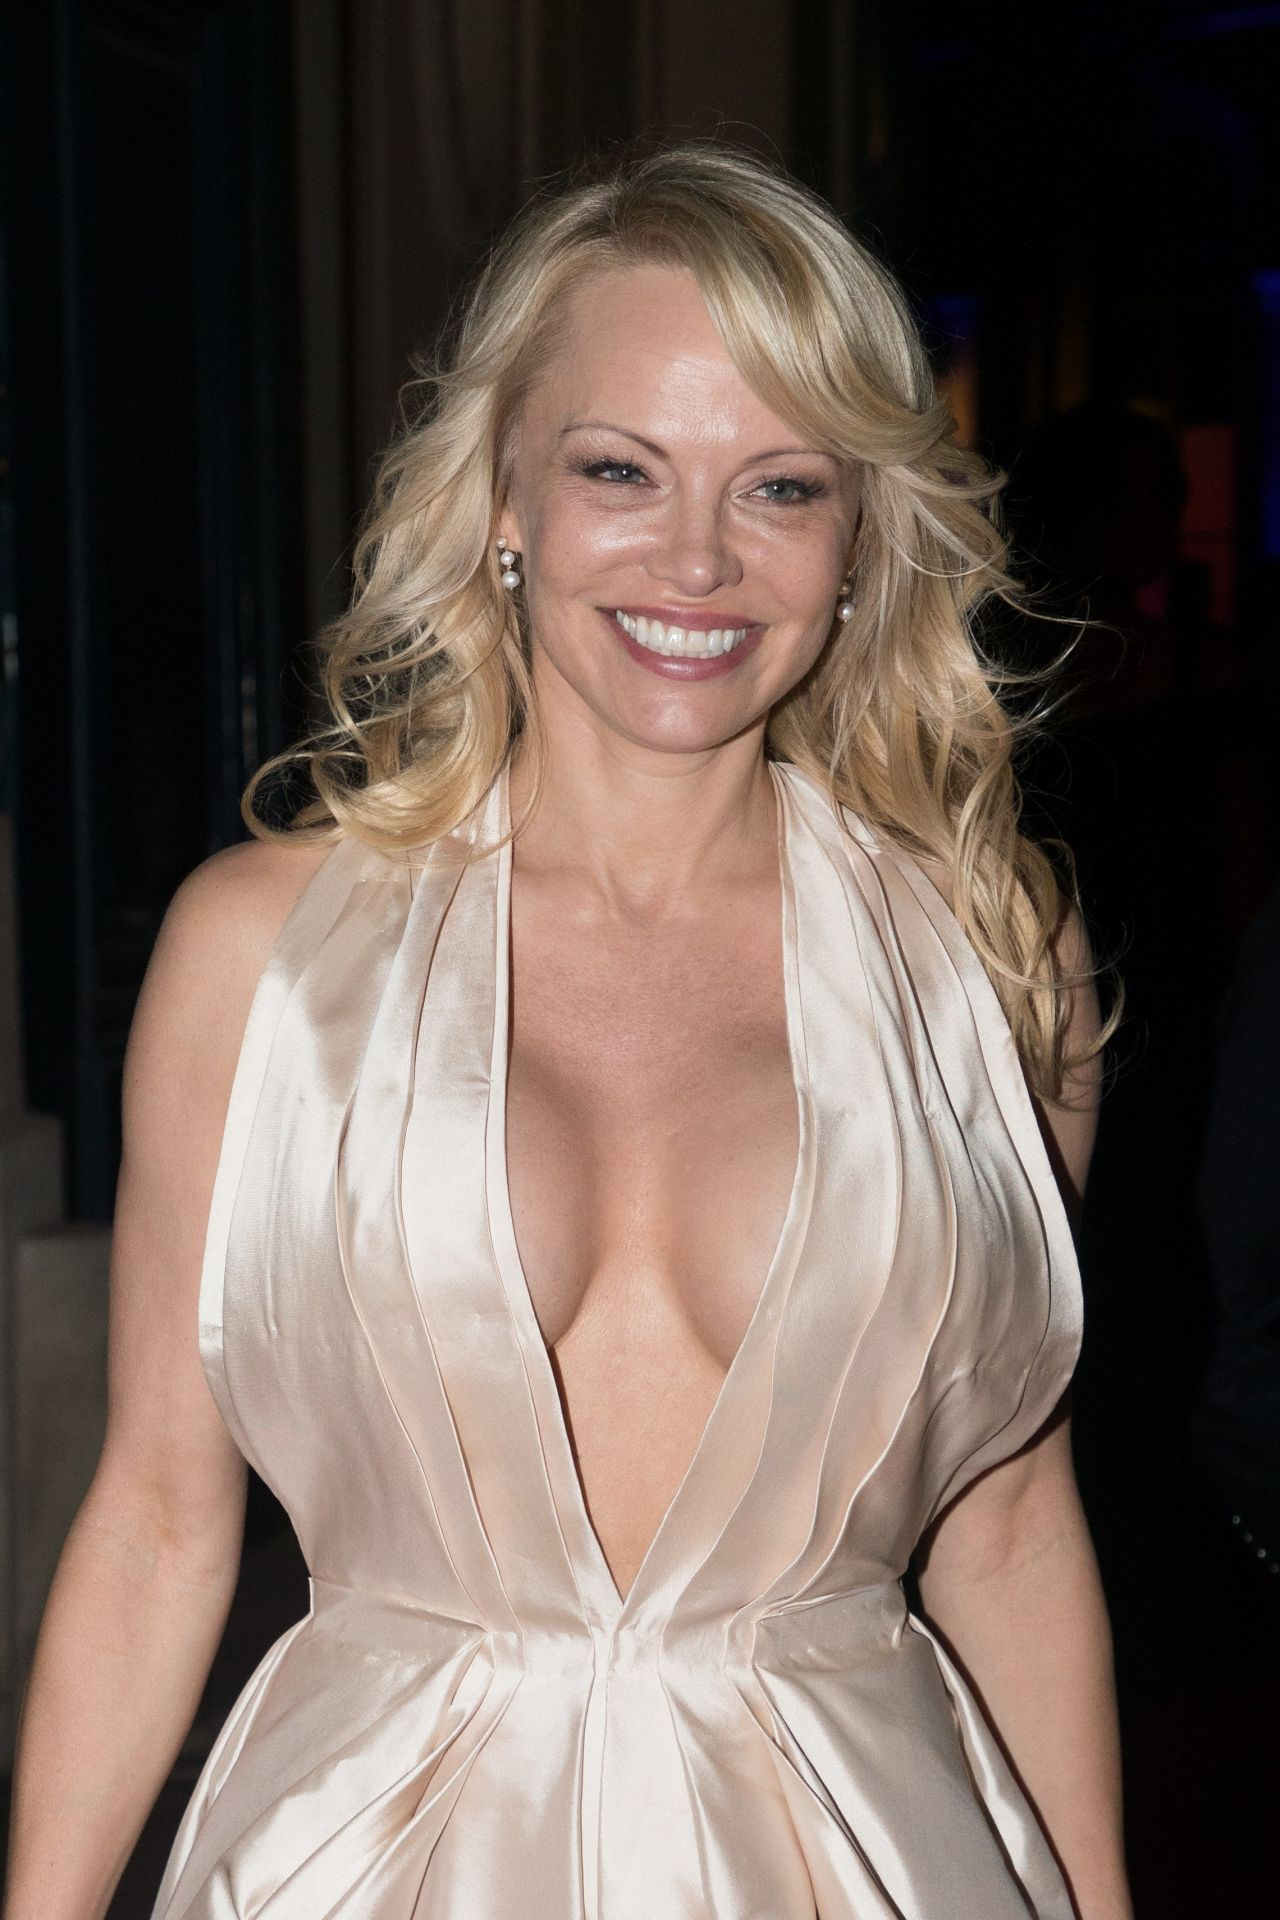 Pamela Anderson ACM Dinner Gala F1 Grand Prix Of Monaco